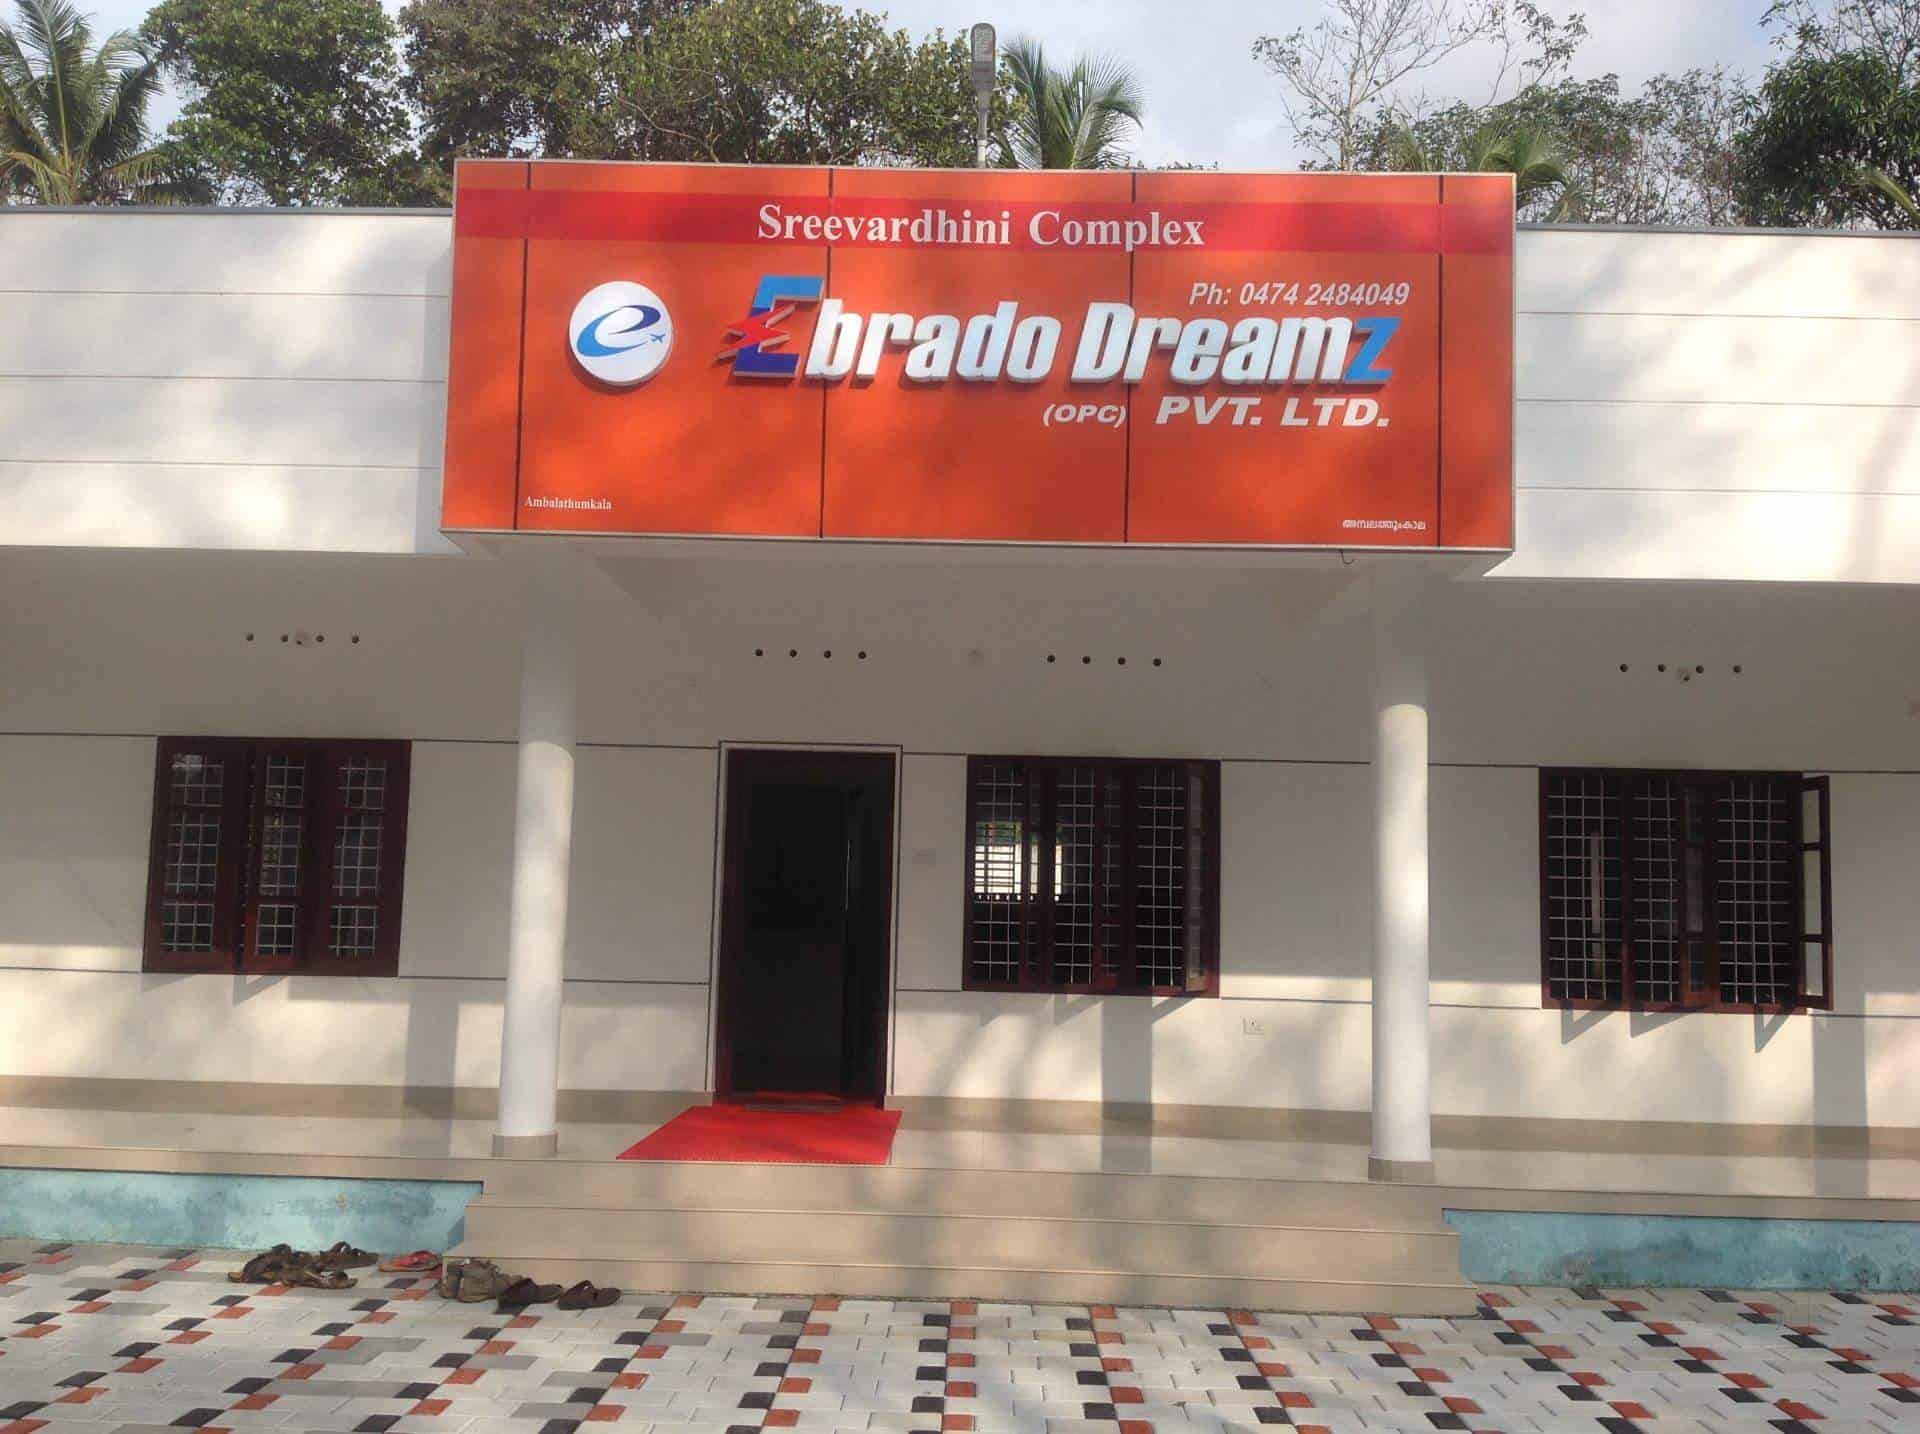 Ebrado Dreamz Pvt ltd overseas Recruitment Agency